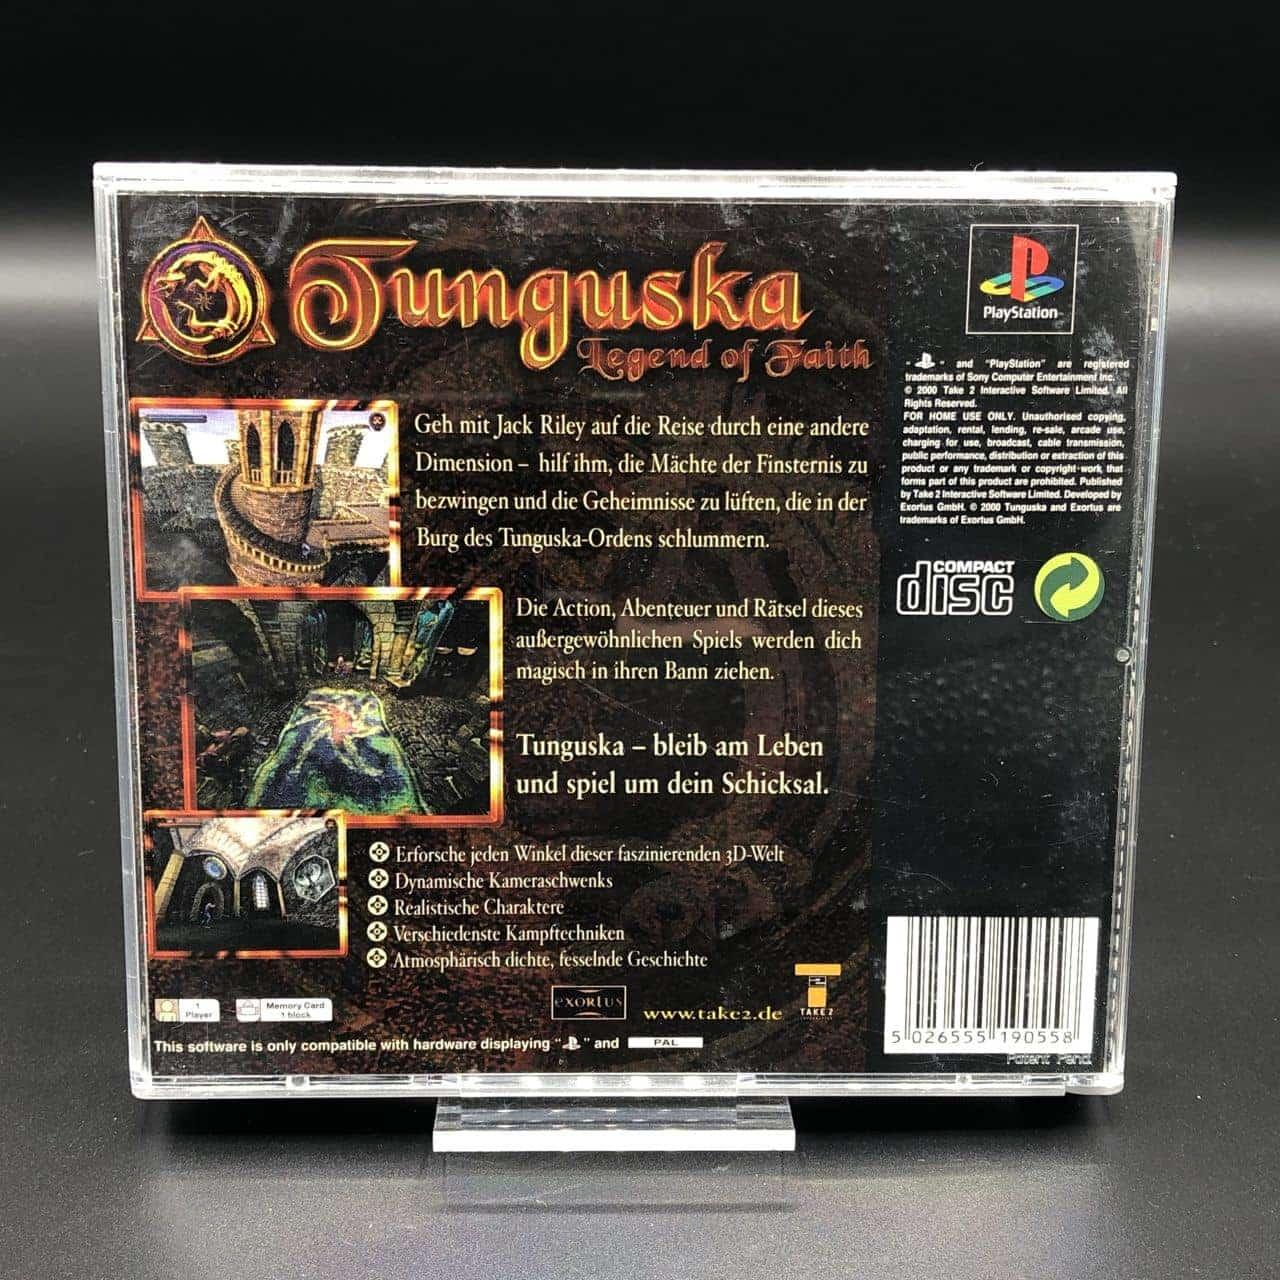 PS1 Tunguska: Legend of Faith (Komplett) (Gut) Sony PlayStation 1